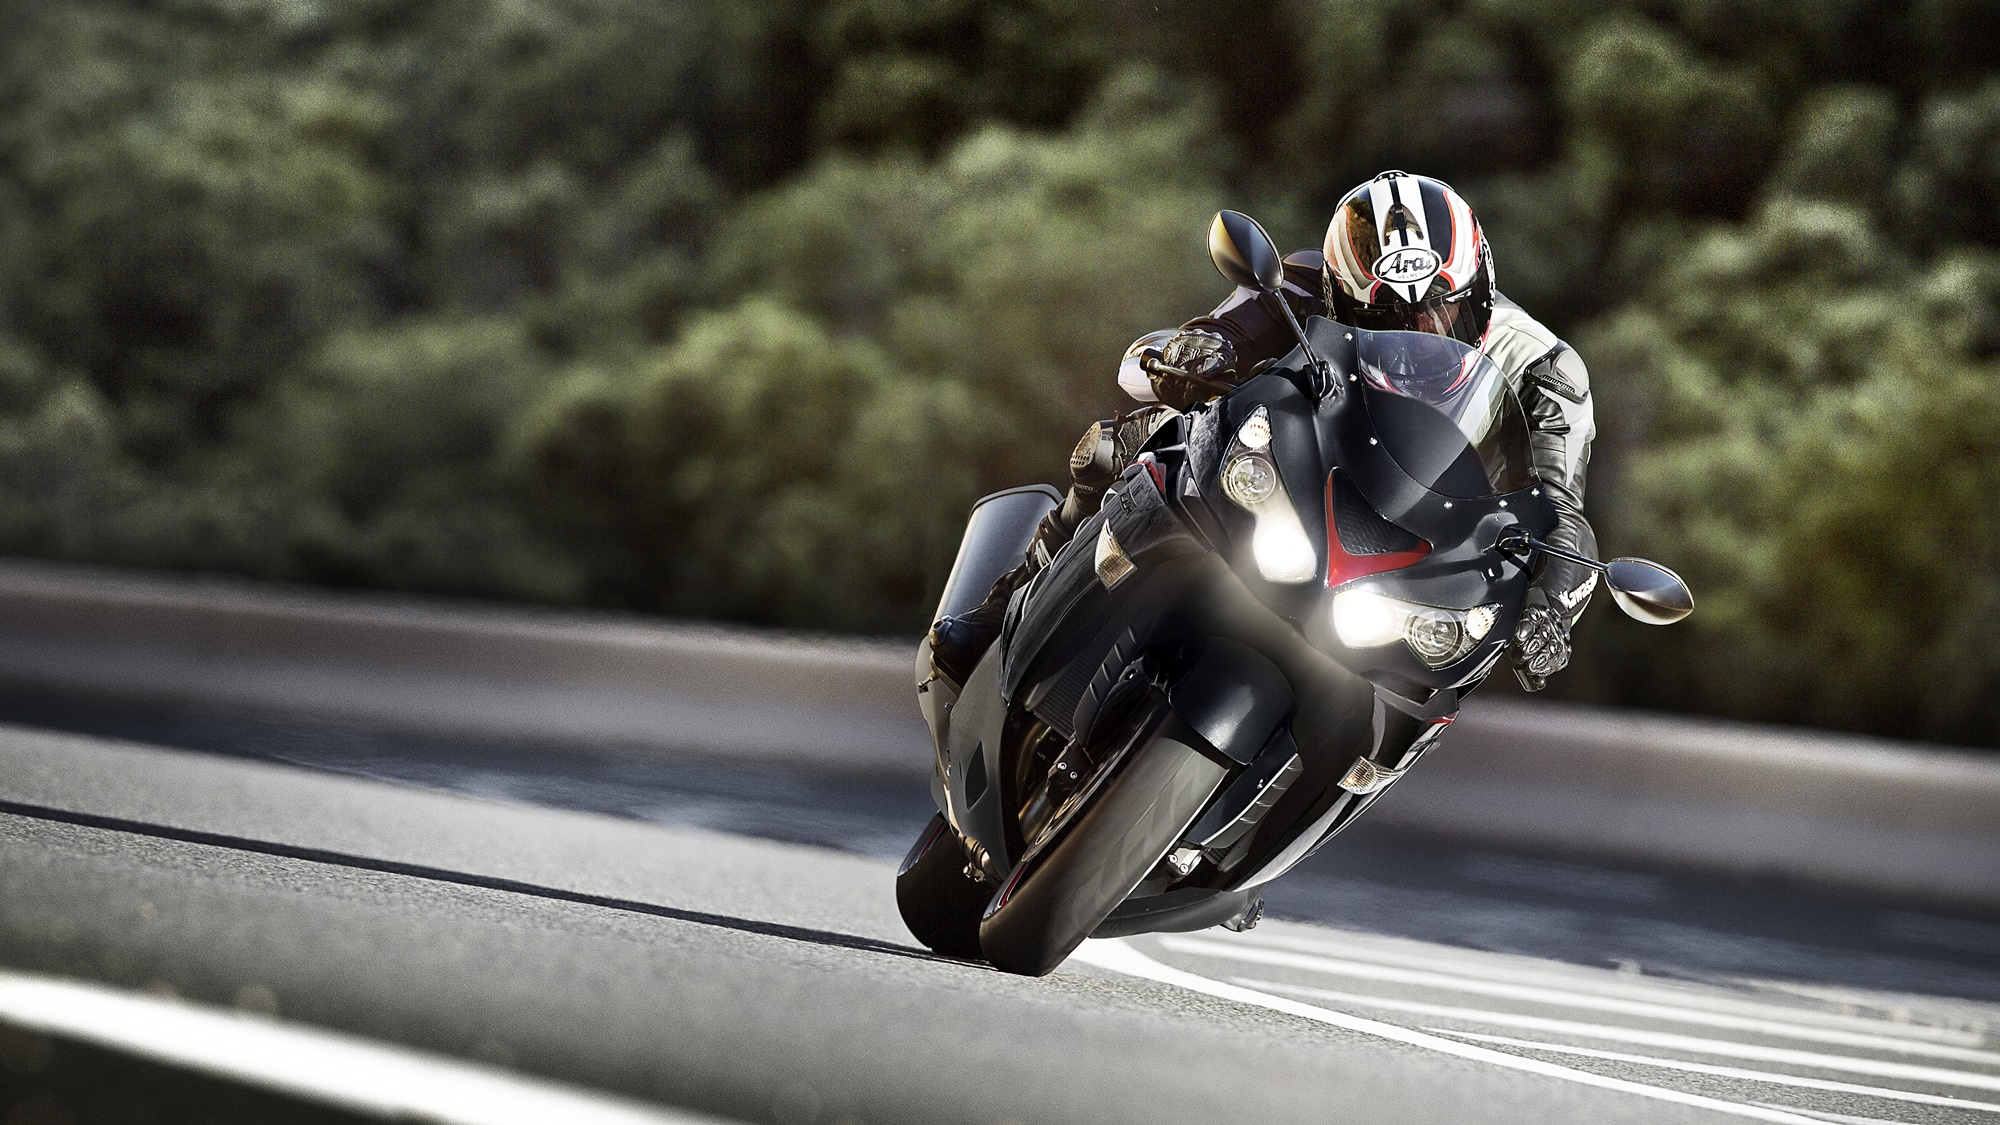 2019 Kawasaki Zx 14r Hd Wallpaper Iamabiker Everything Motorcycle